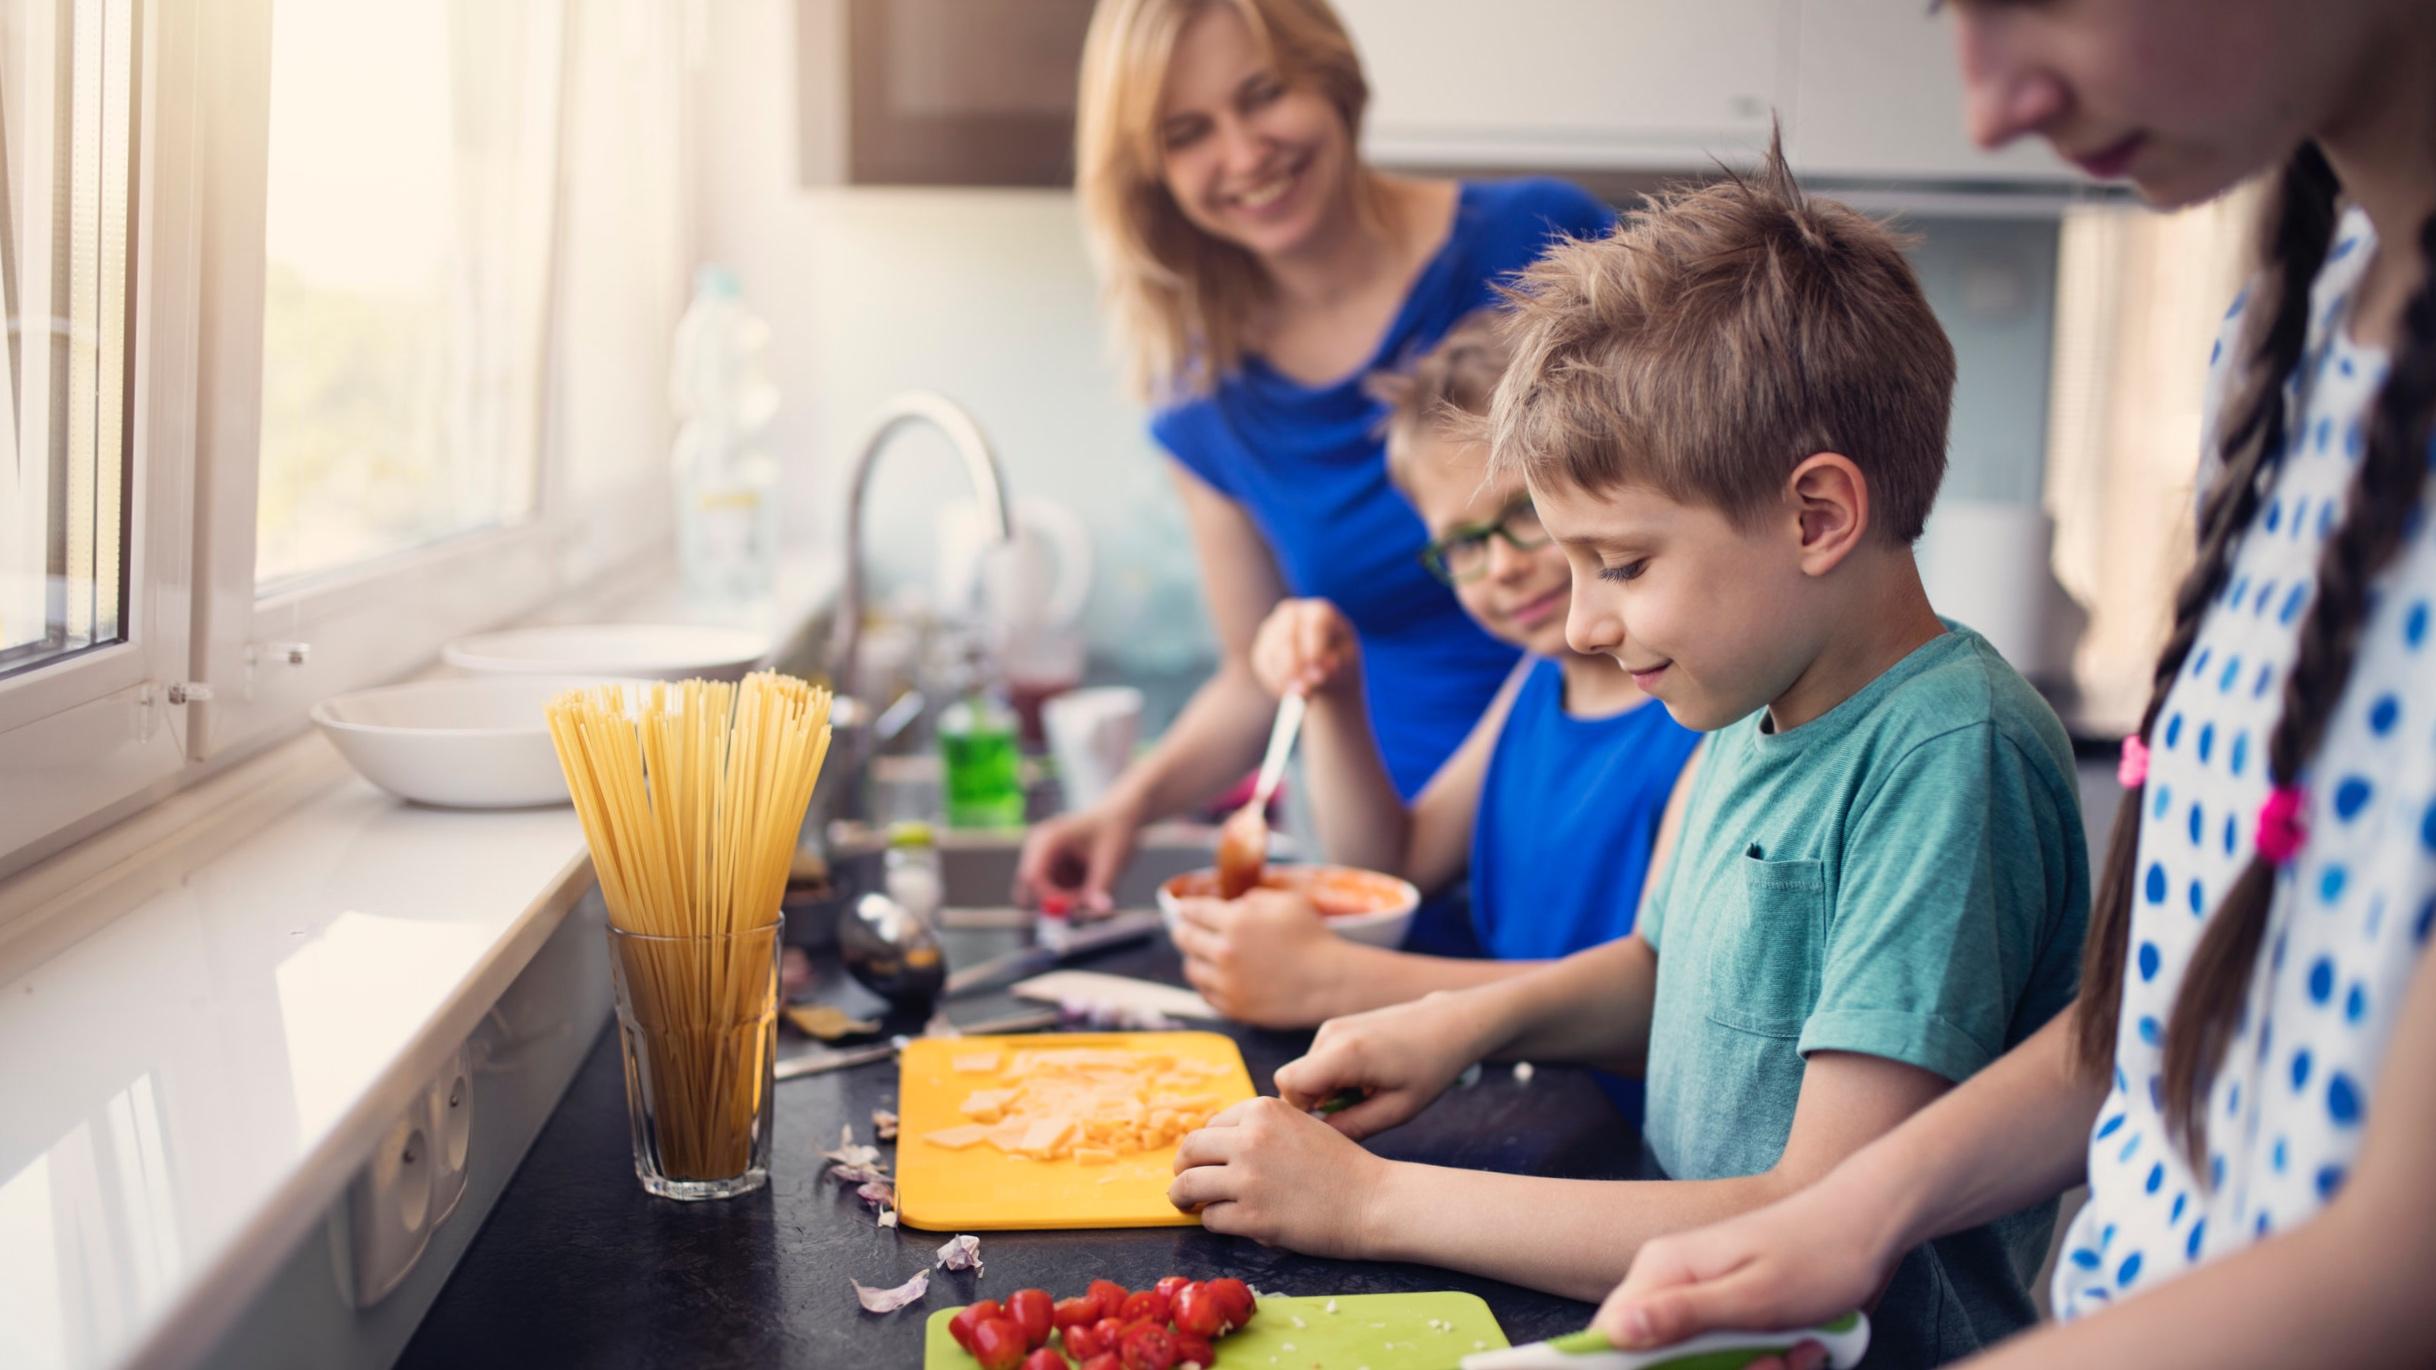 iStock-971346934+Kids+Making+Lunch.jpg